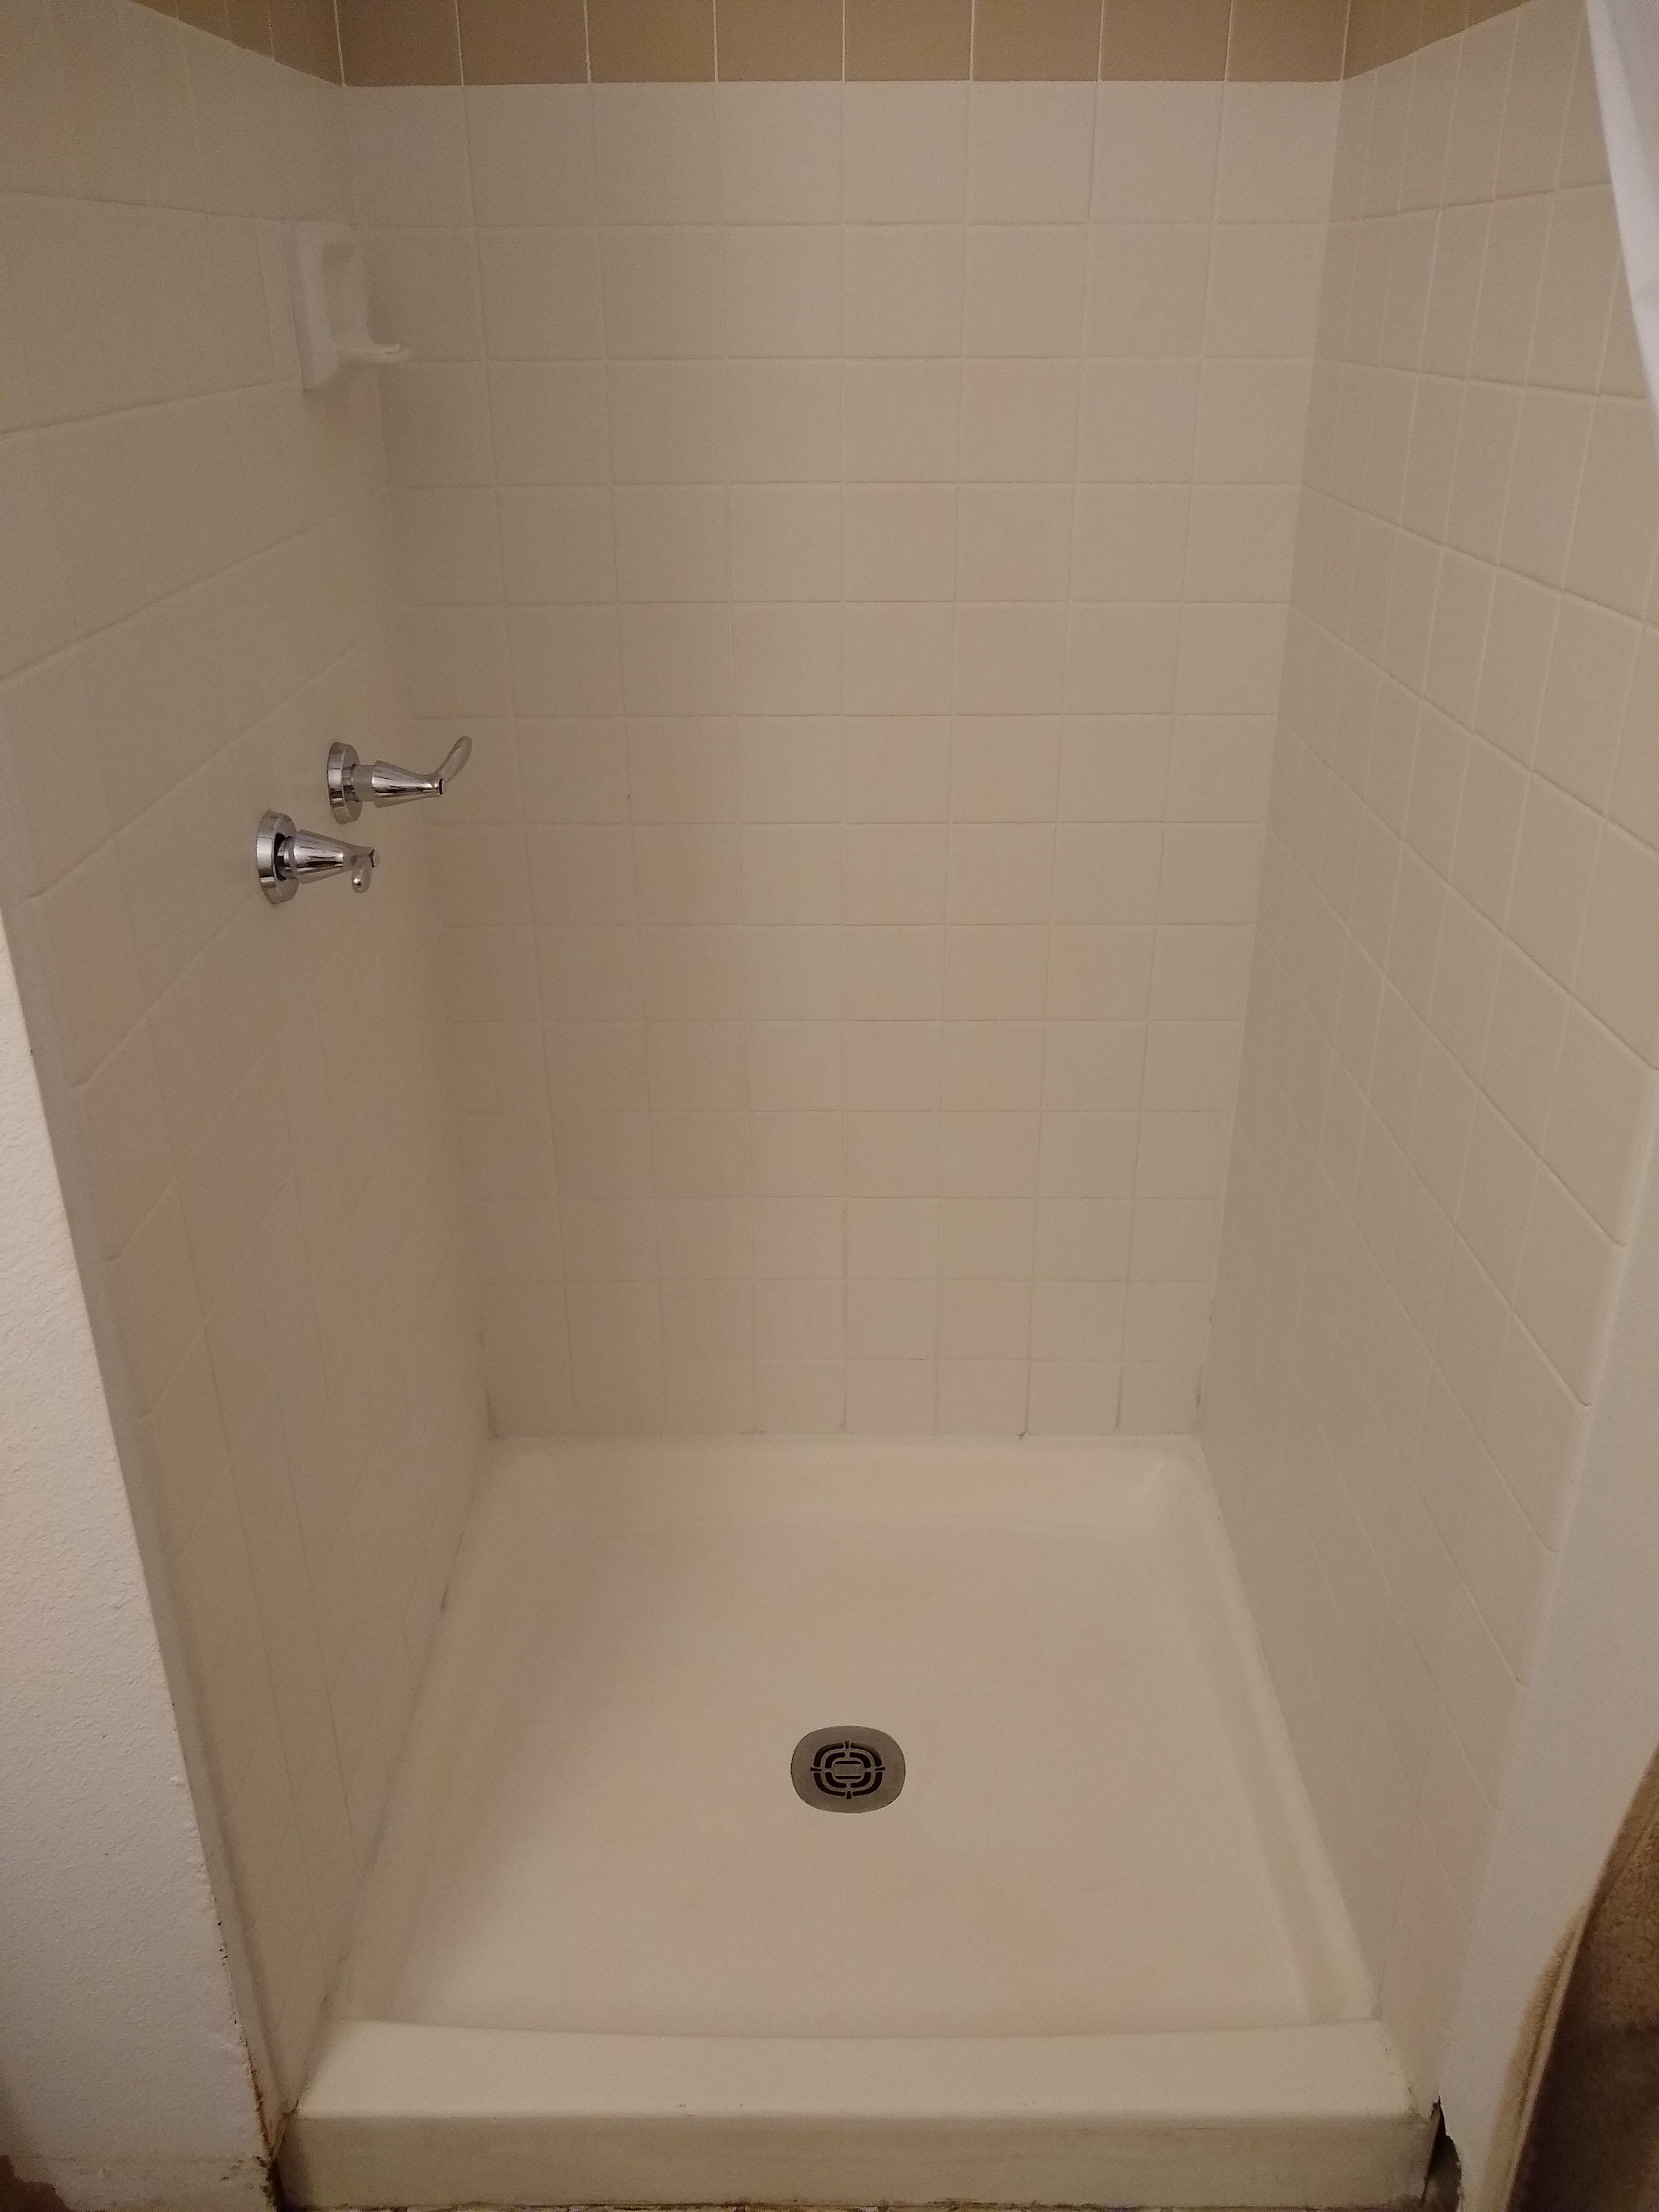 Rog3 Kit 1 The Ultimate Bathtub And Shower Cleaner Bathtub